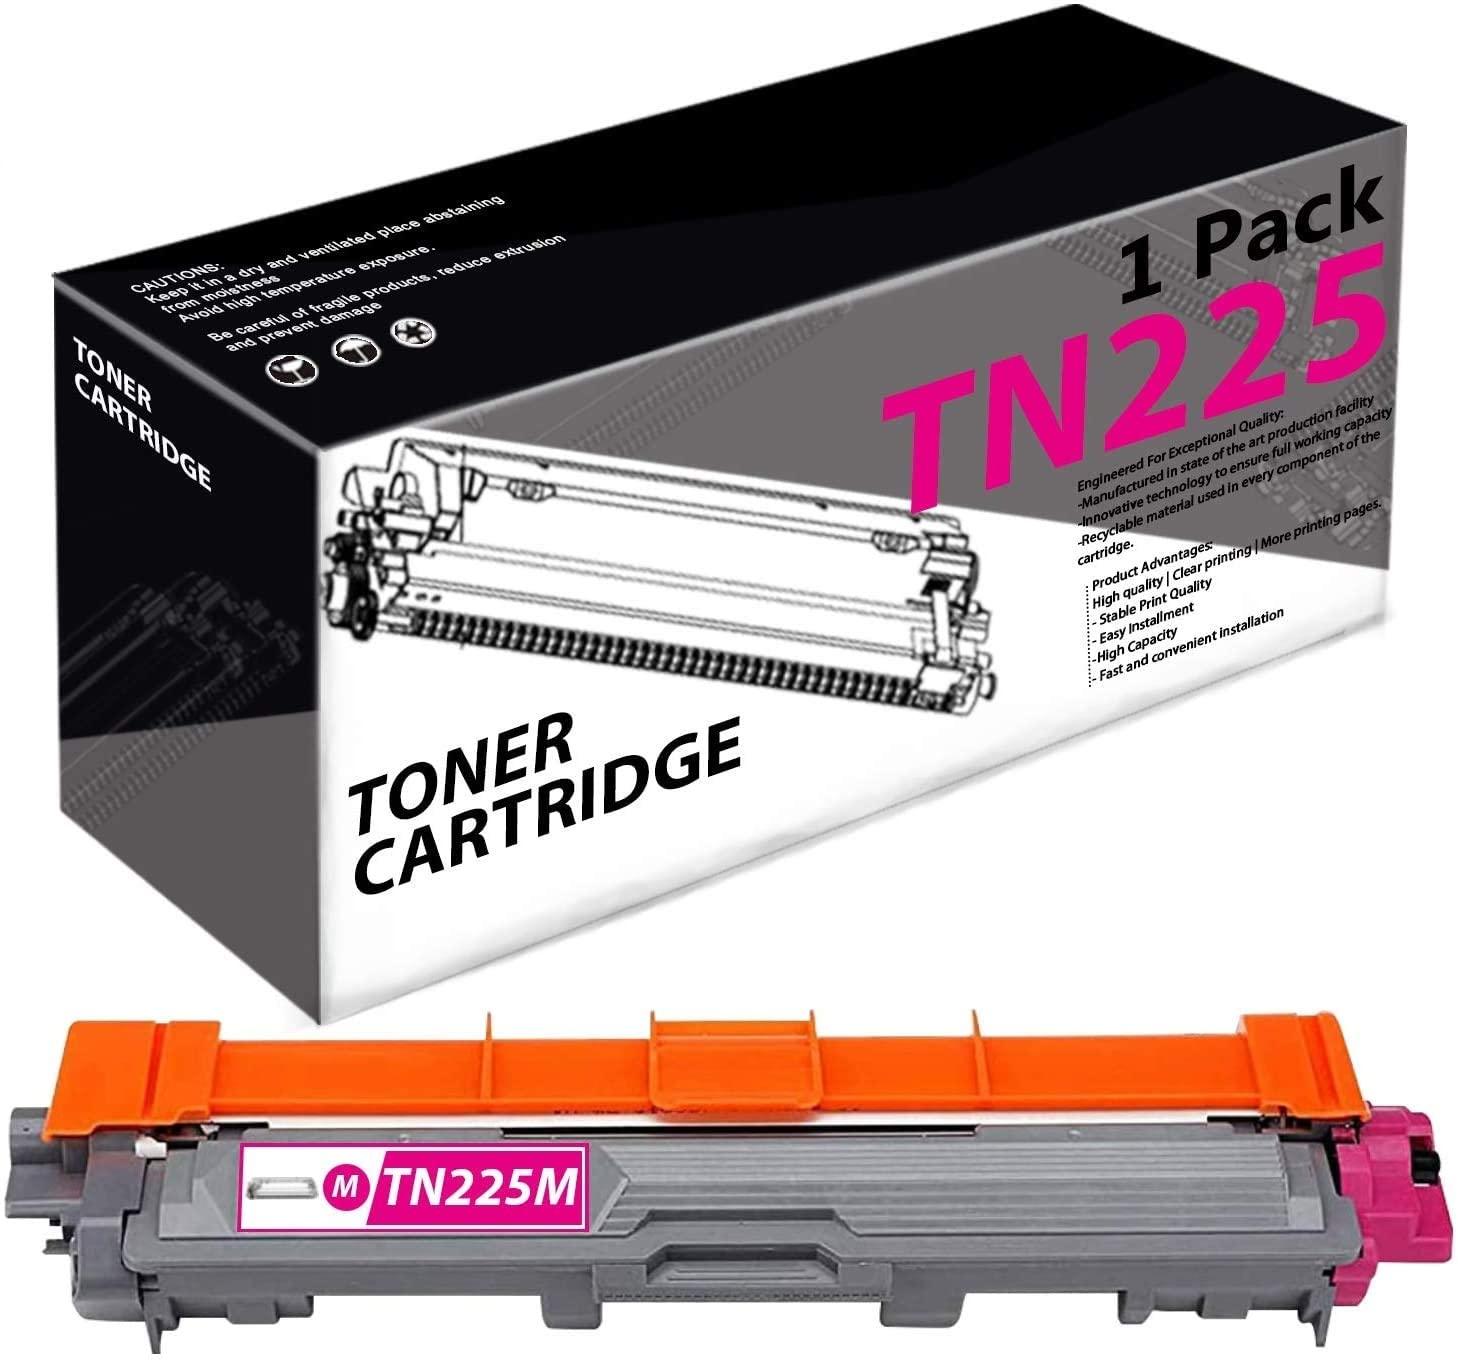 TN225(1 Pack-Magenta) Compatible Toner Cartridge Replacement for Brother MFC-9130CW 9140CDN 9330CDW 9340CDW HL-3140CW 3150CDN 3170CDW 3180CDW DCP-9015CDW 9020CDN Printers.